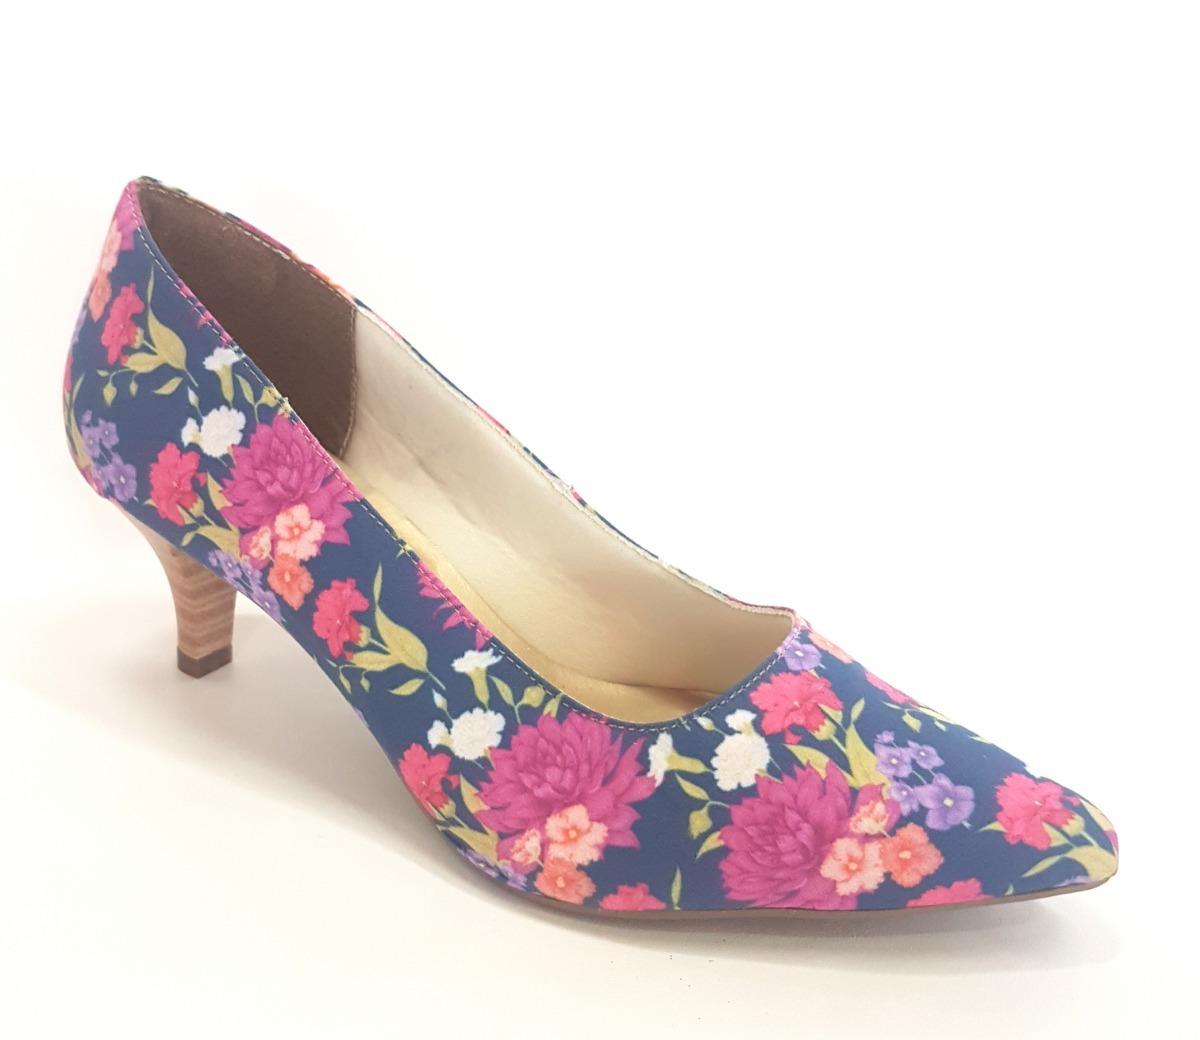 49224ccaf1 Sapato Feminino Scarpin Estampado Salto Médio 6cm Tendência - R  134 ...